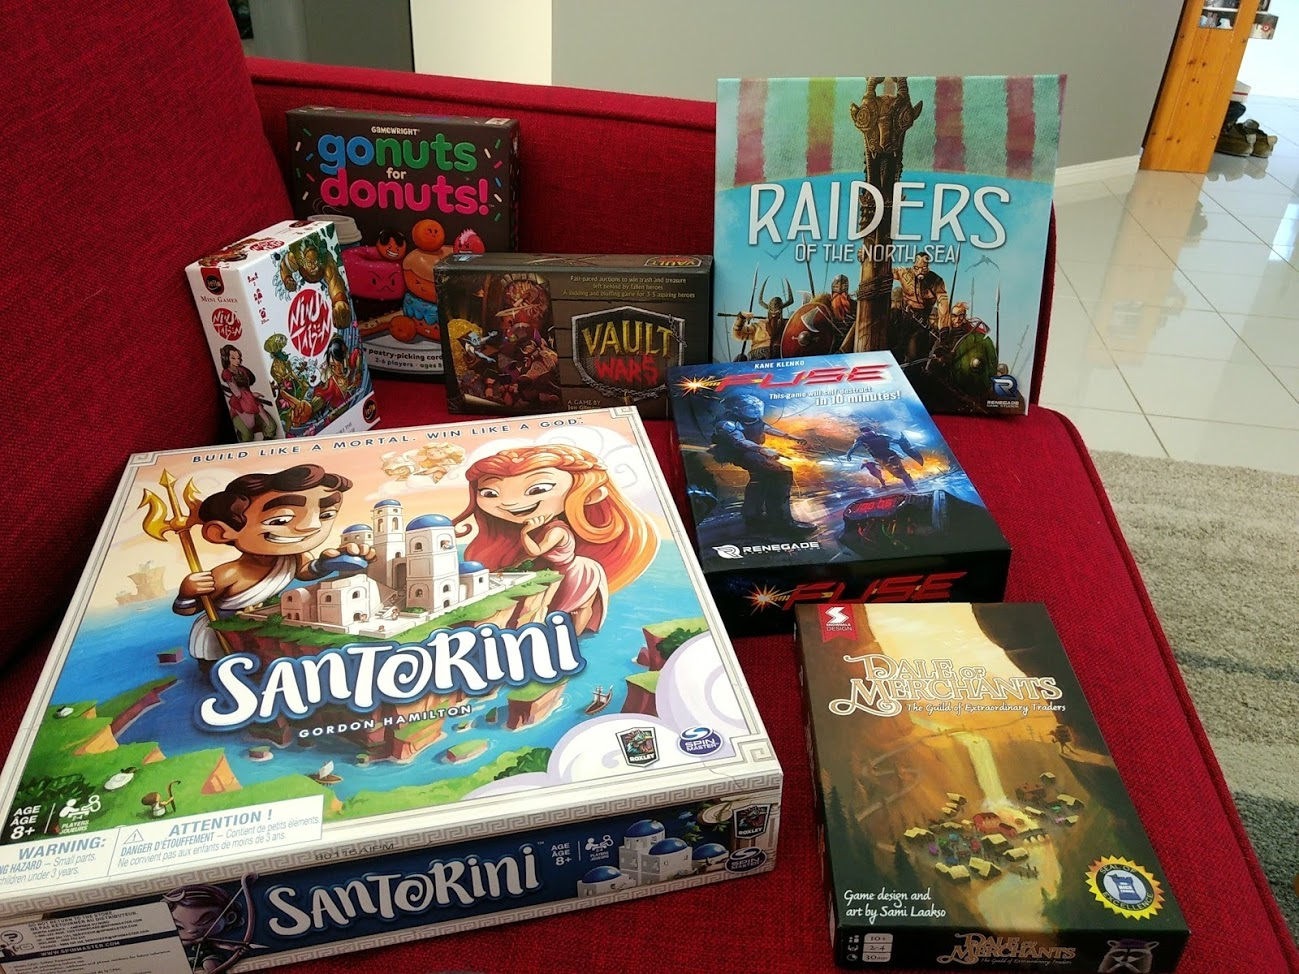 Board game haul includes: Dale of Merchants, Santorini, Fuse, Raiders of the North Sea, Vault Wars, Ninja Taisen, Go Nuts for Donuts.